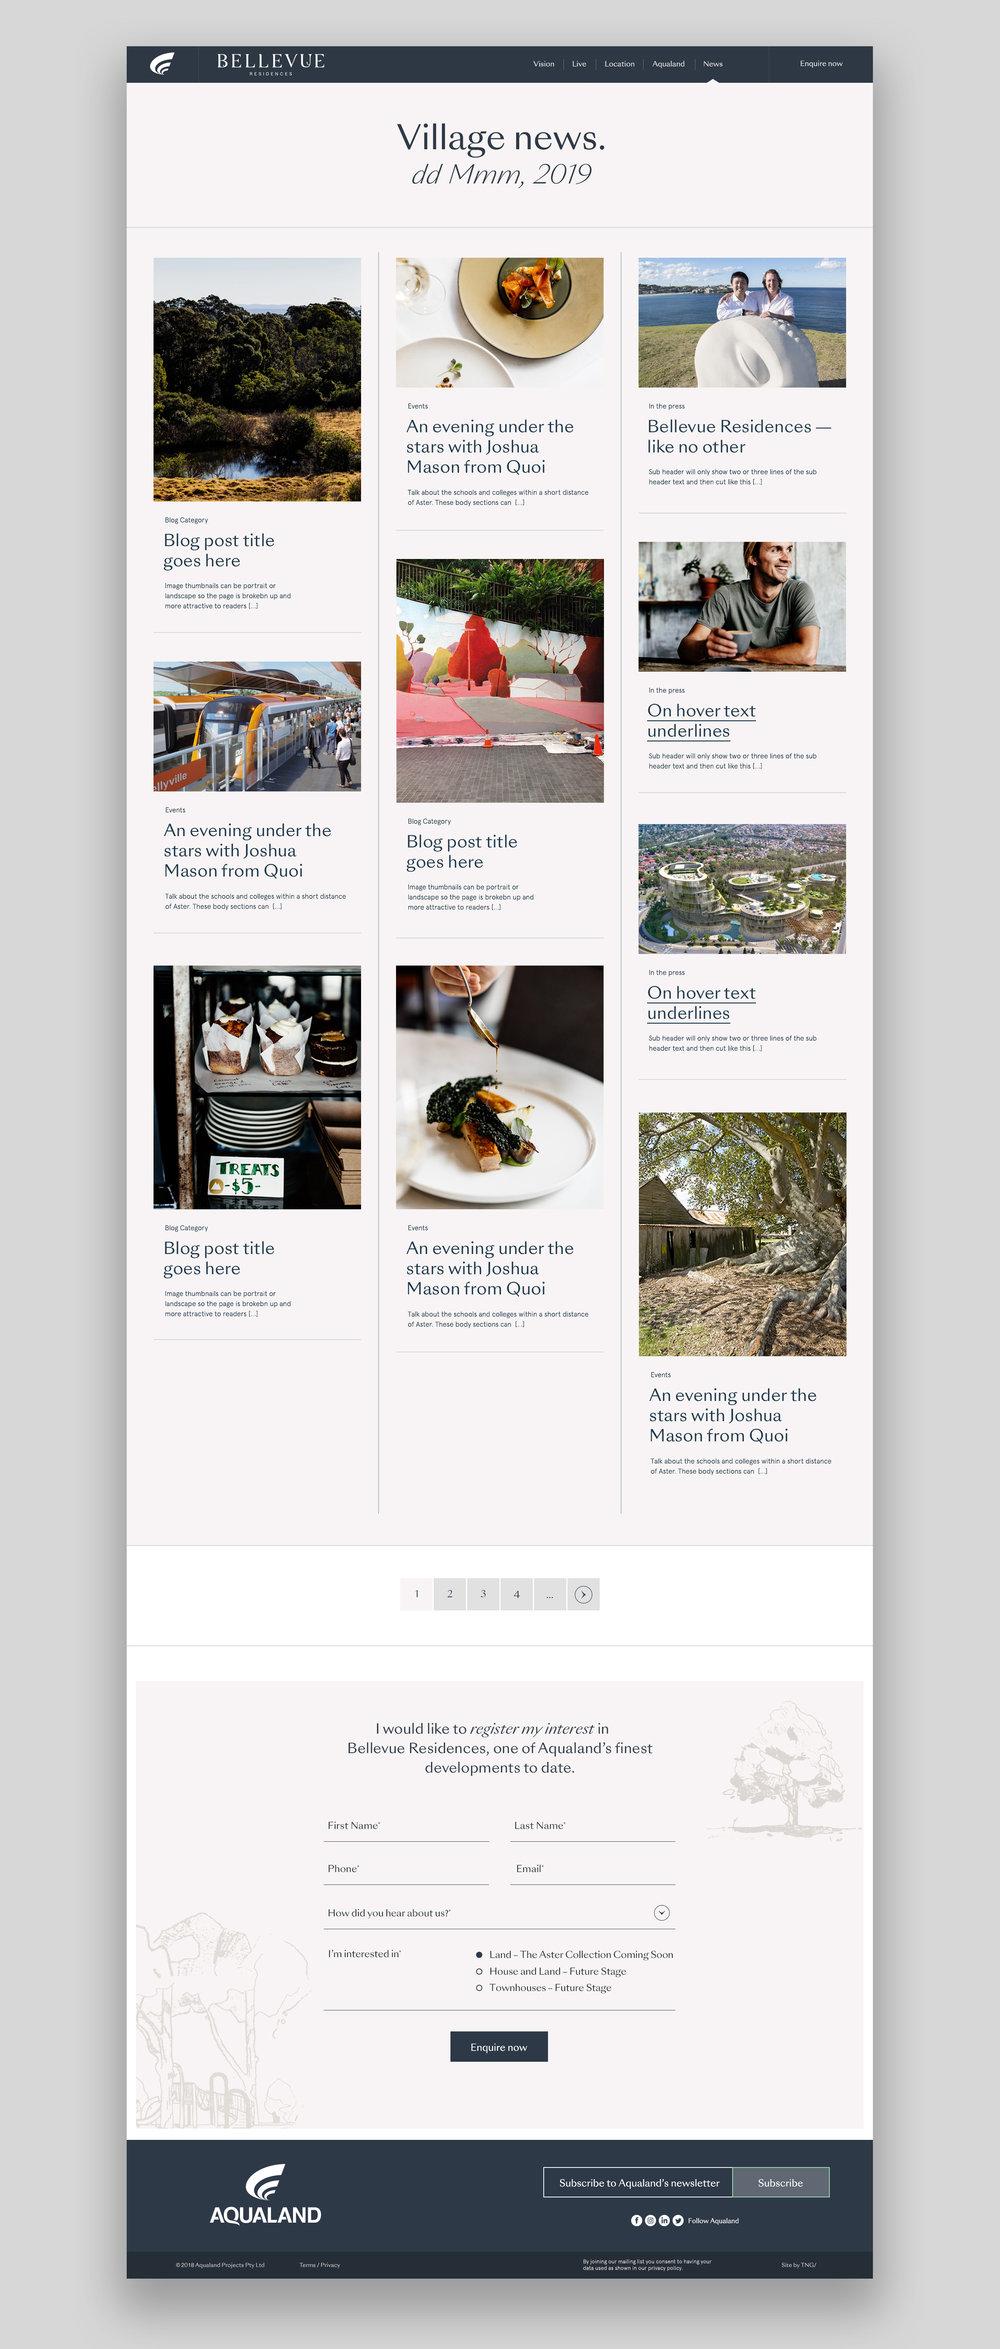 aqualand_bellevue_residences_brand_identity_property_sydney_marketing copy 9.jpg